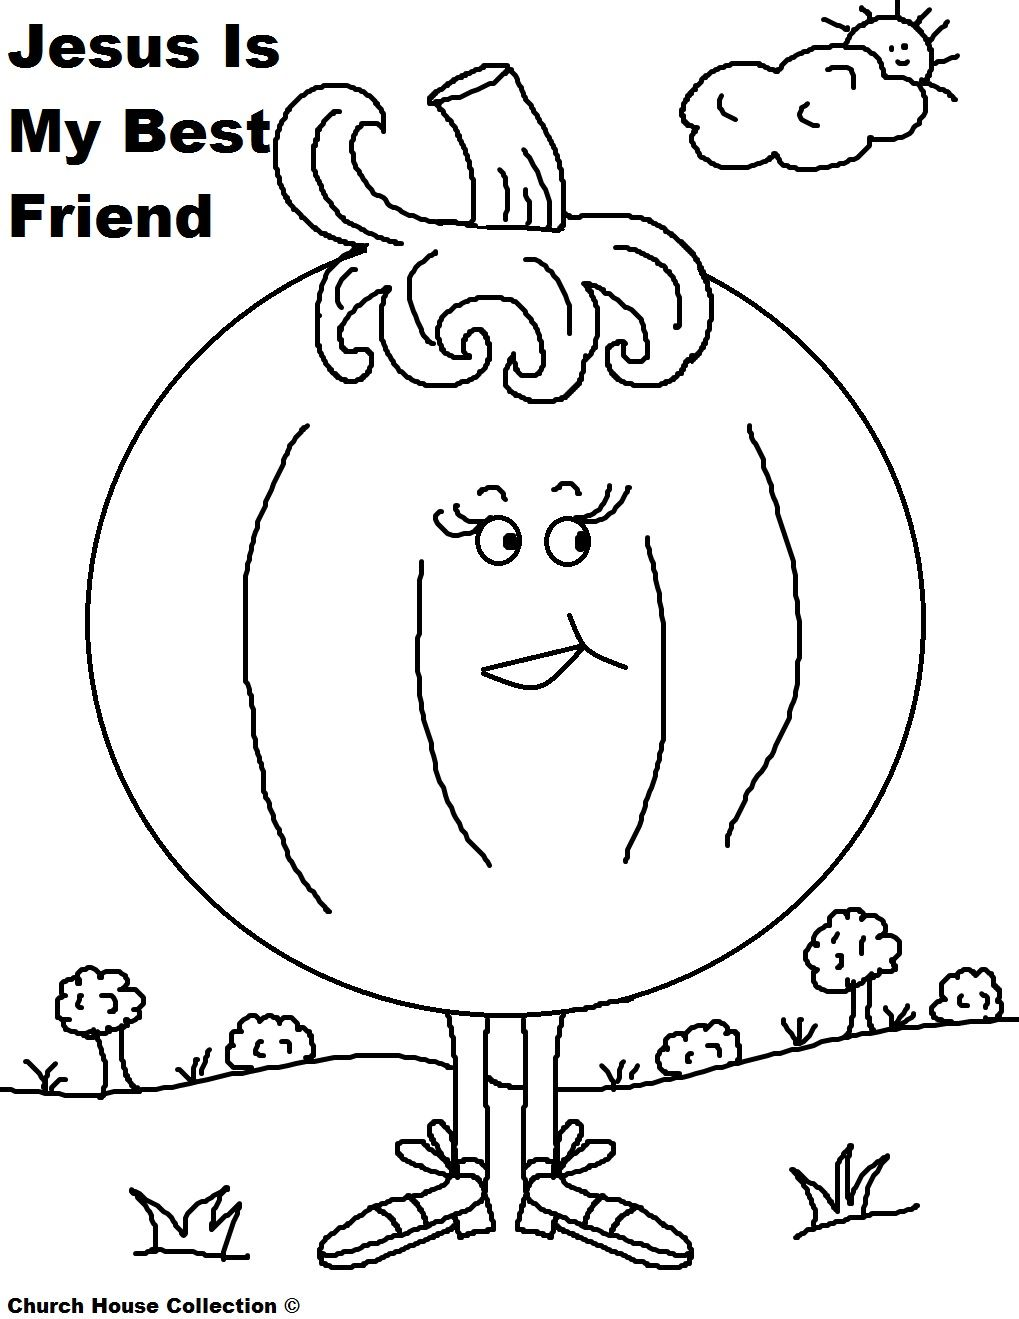 Pumpkin Coloring Page For Sunday School Kids Jesus Is My Best Friend Jpg 1019 1319 Sunday School Kids Sunday School Coloring Pages School Coloring Pages